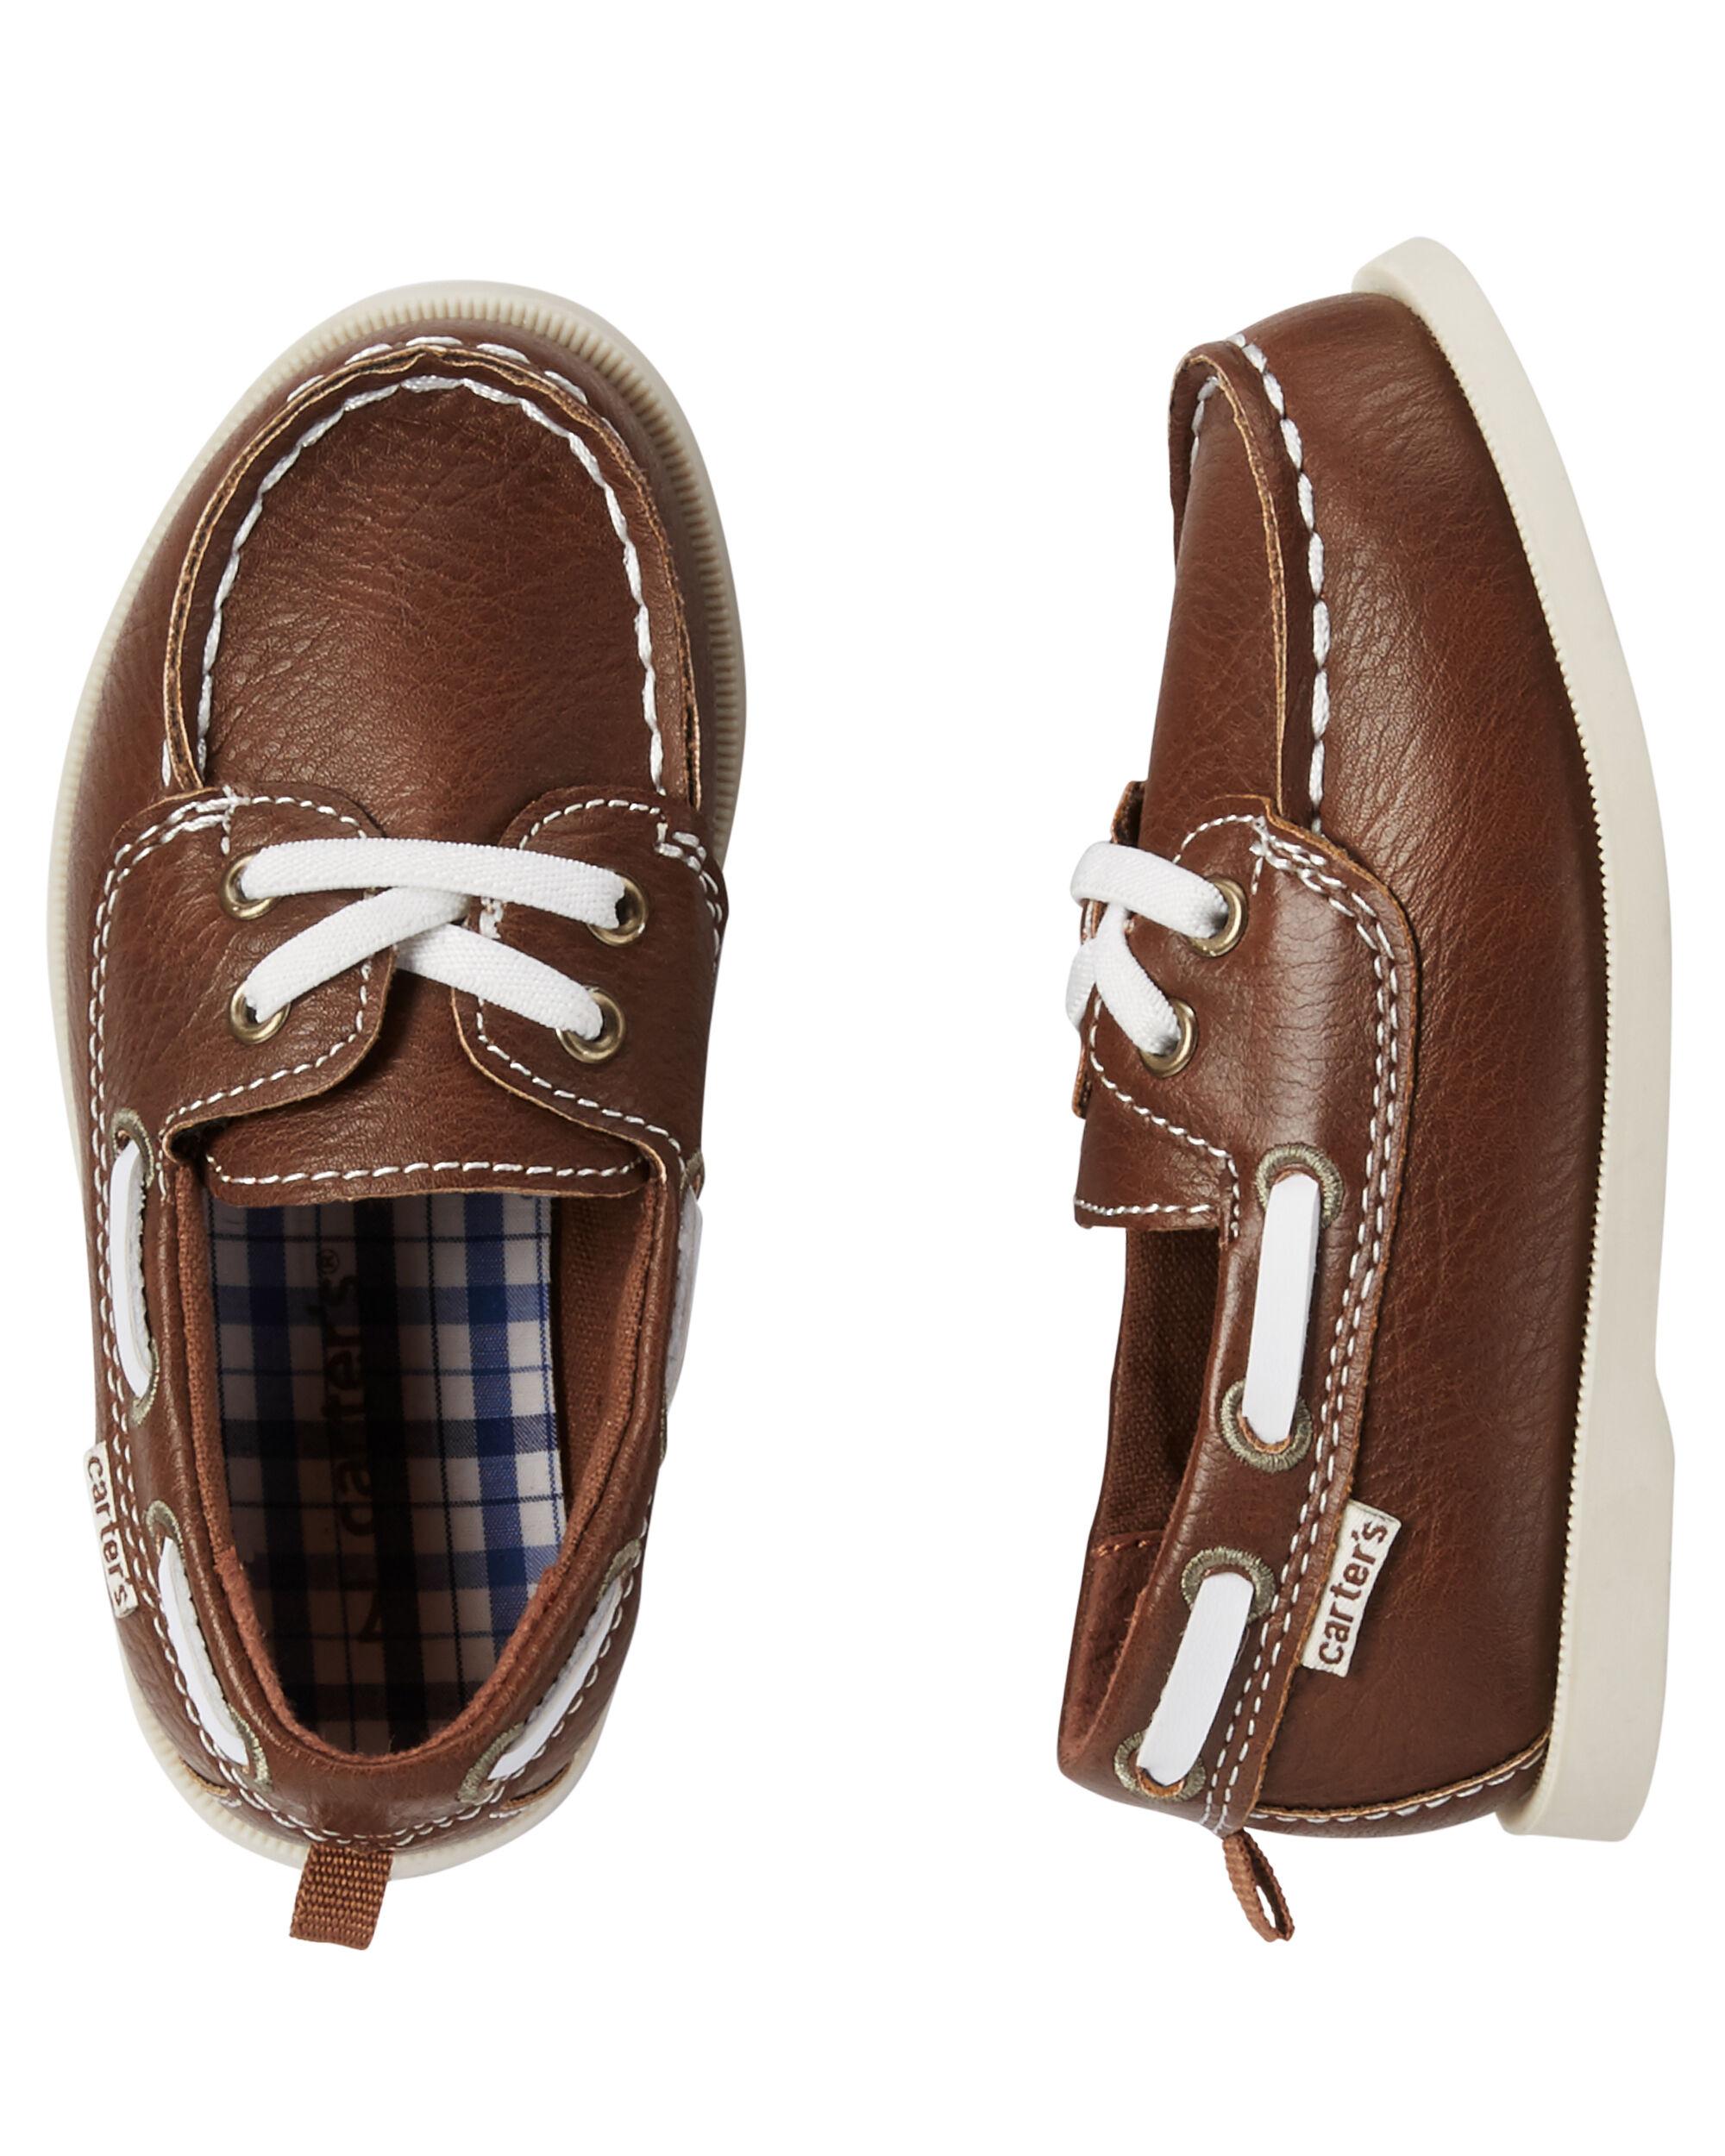 fa4fda0b3 Toddler Boy Carter s Boat Shoes